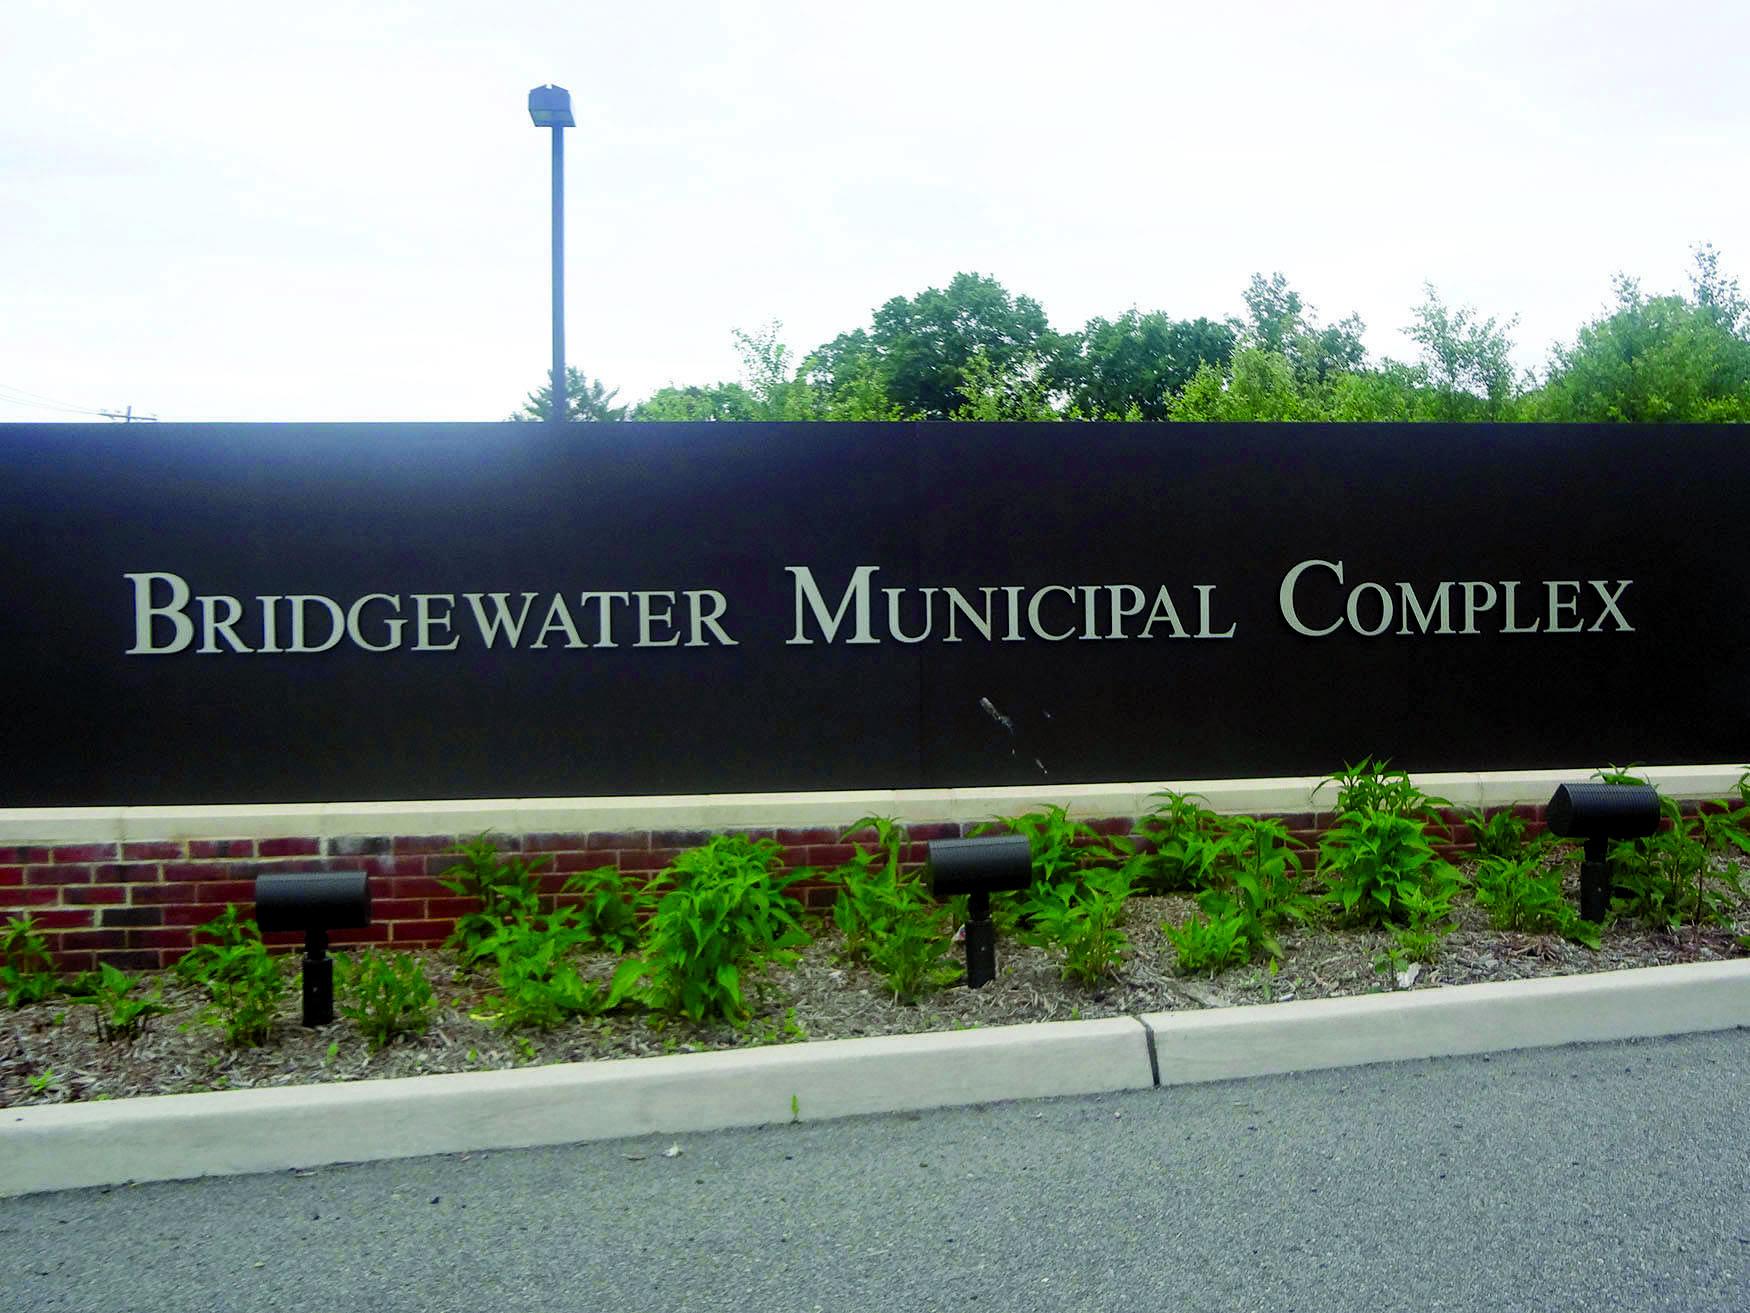 9055e75a1cef0b8018c9_Bridgewater_municipal.jpg